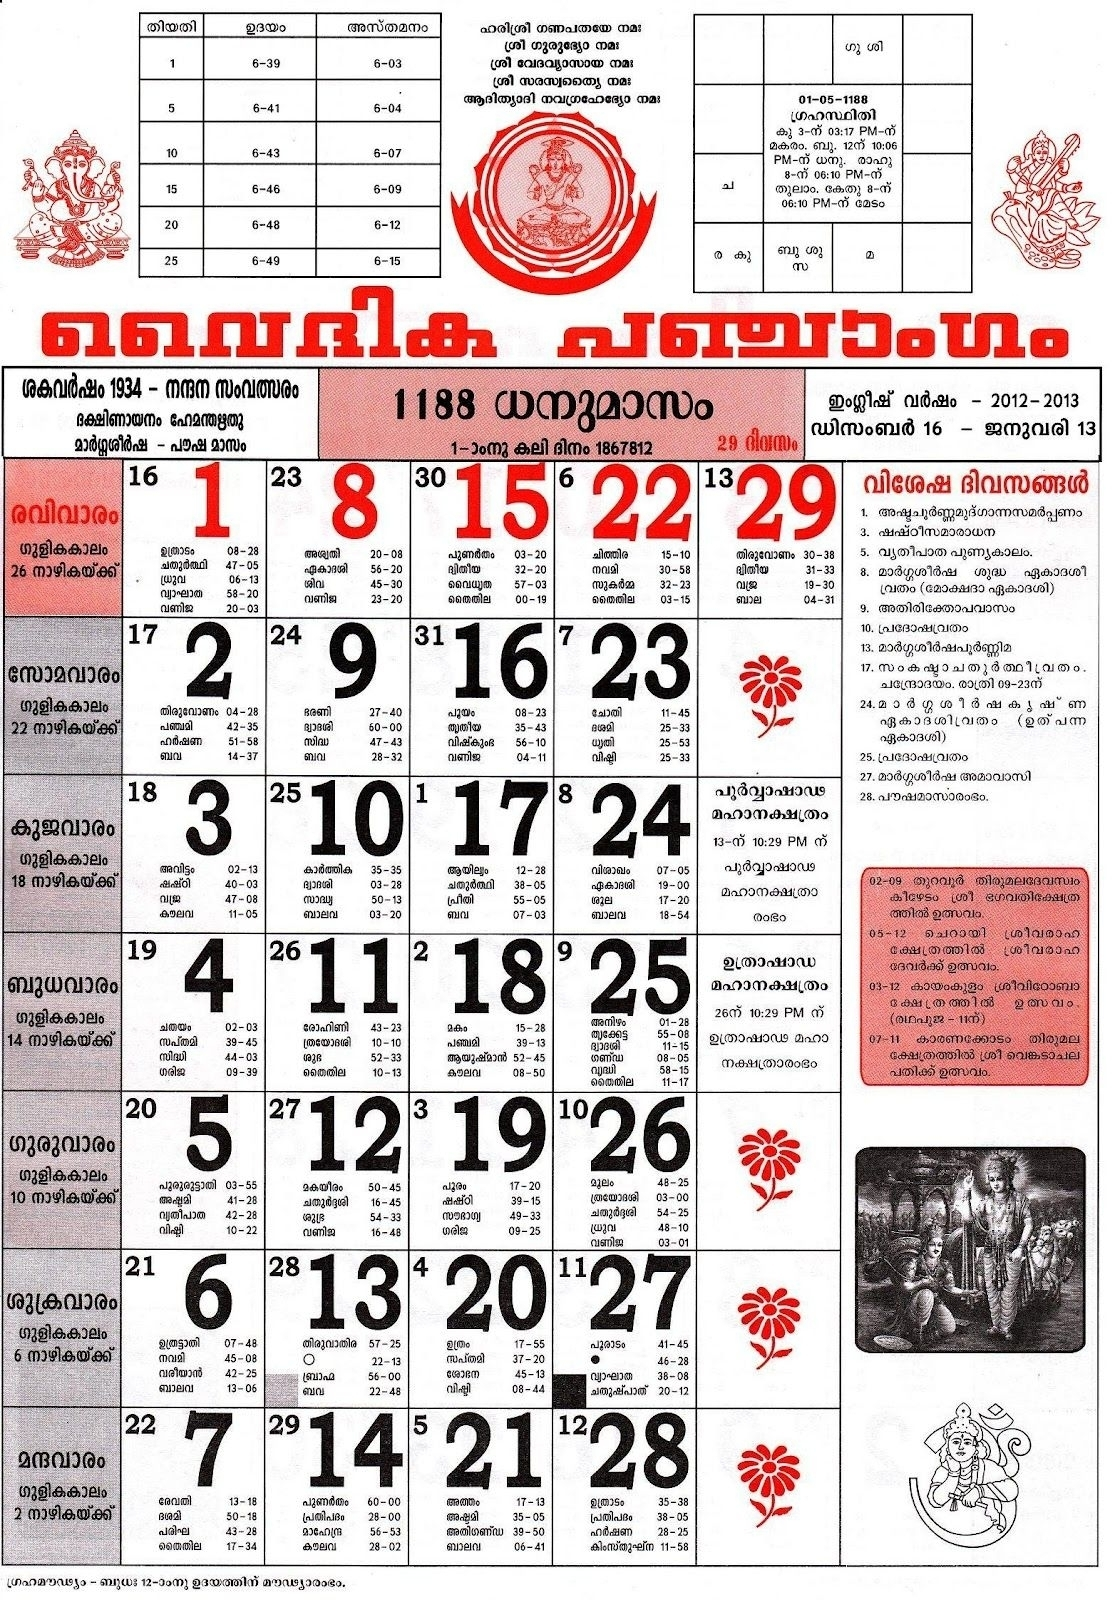 November 2015 Malayala Manorama Calendar | Calendar Format Example with November 2015 Malayala Manorama Calendar